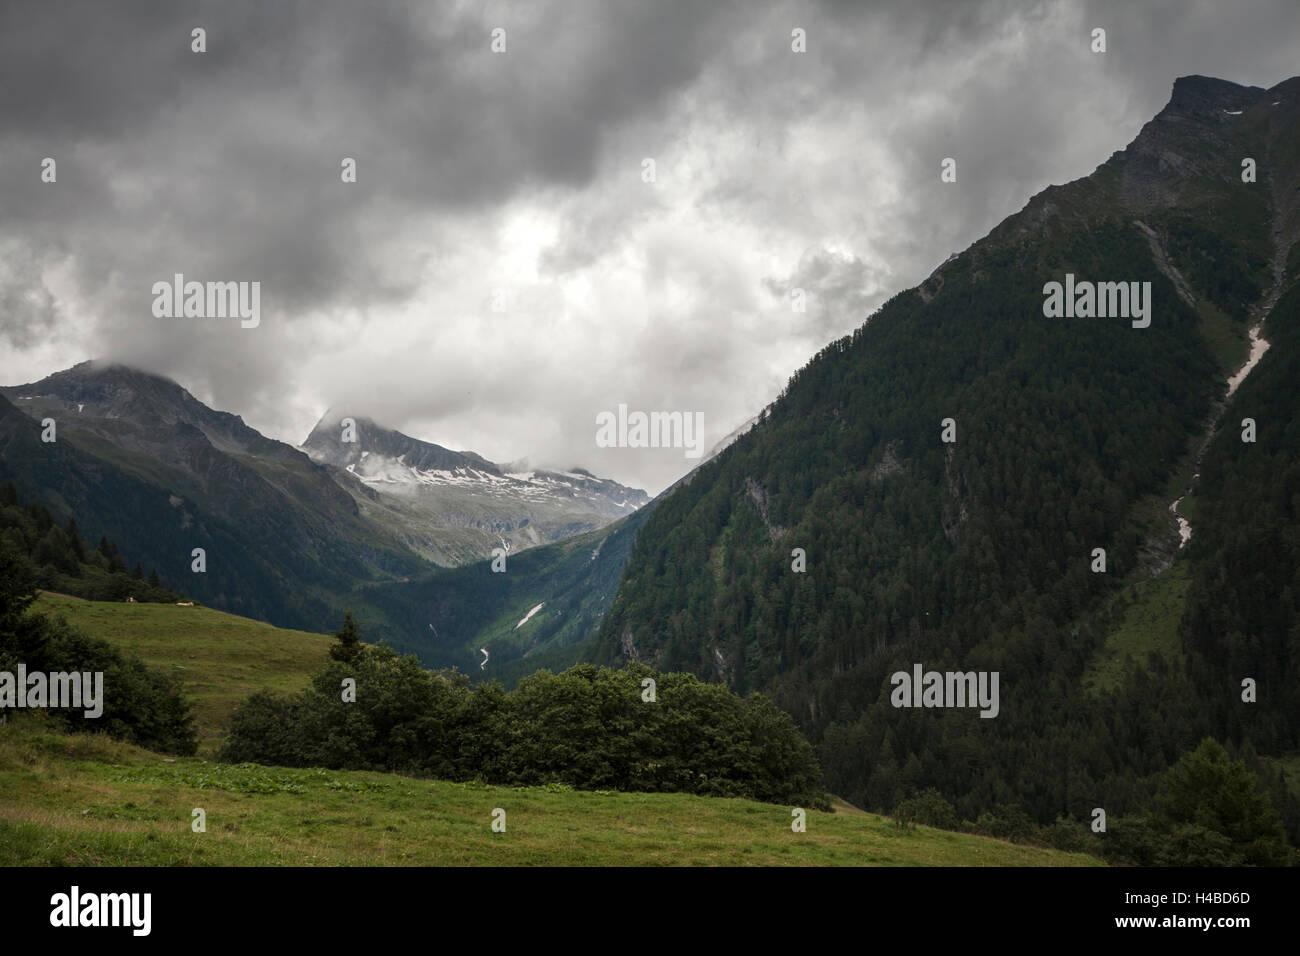 Menacing storm in the Alps - Stock Image